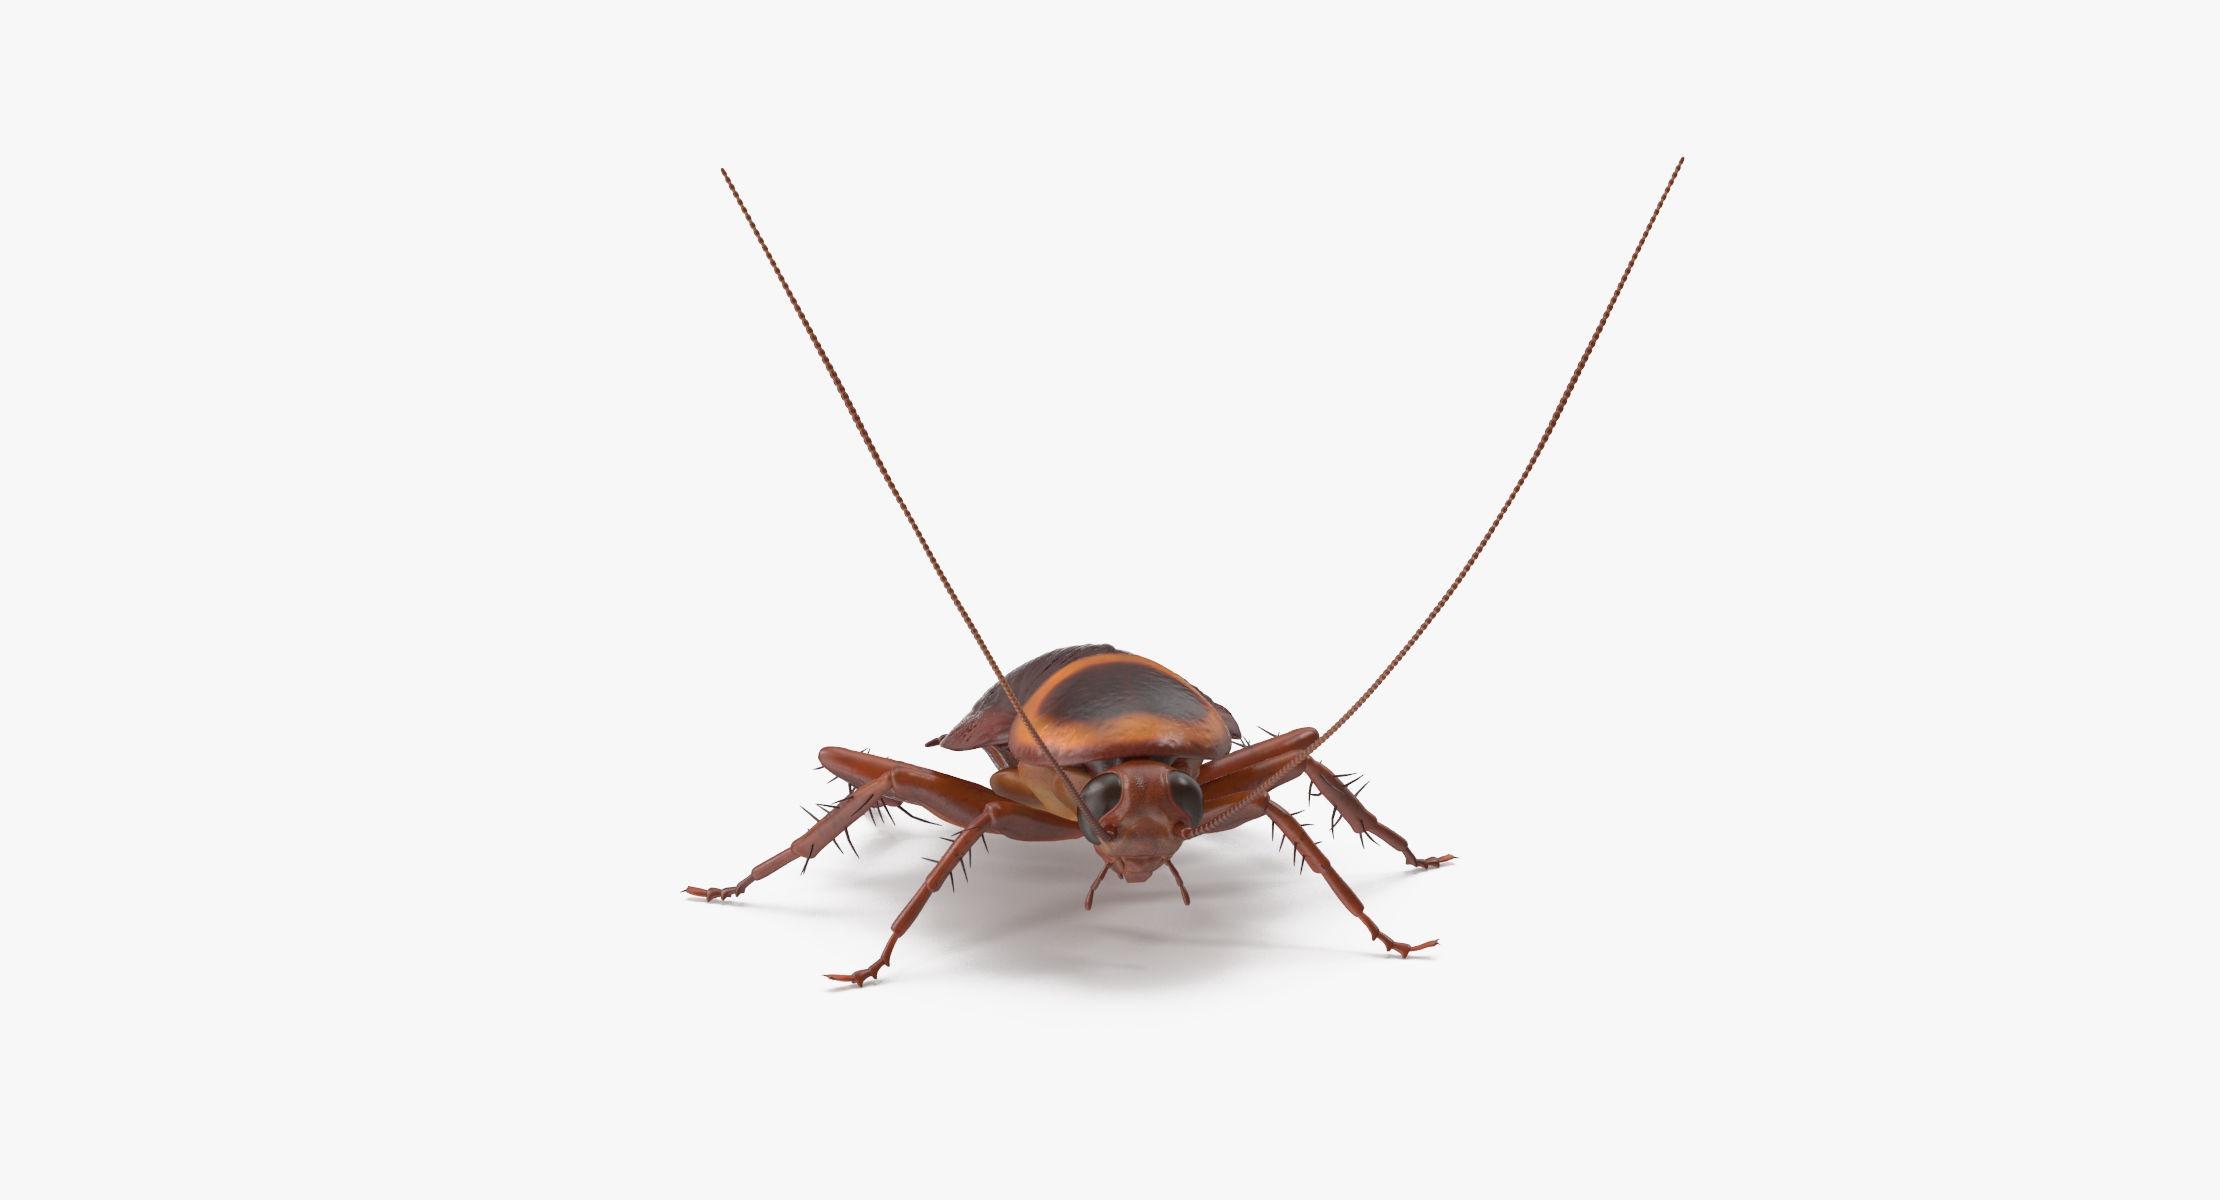 Cockroach 01 - reel 1